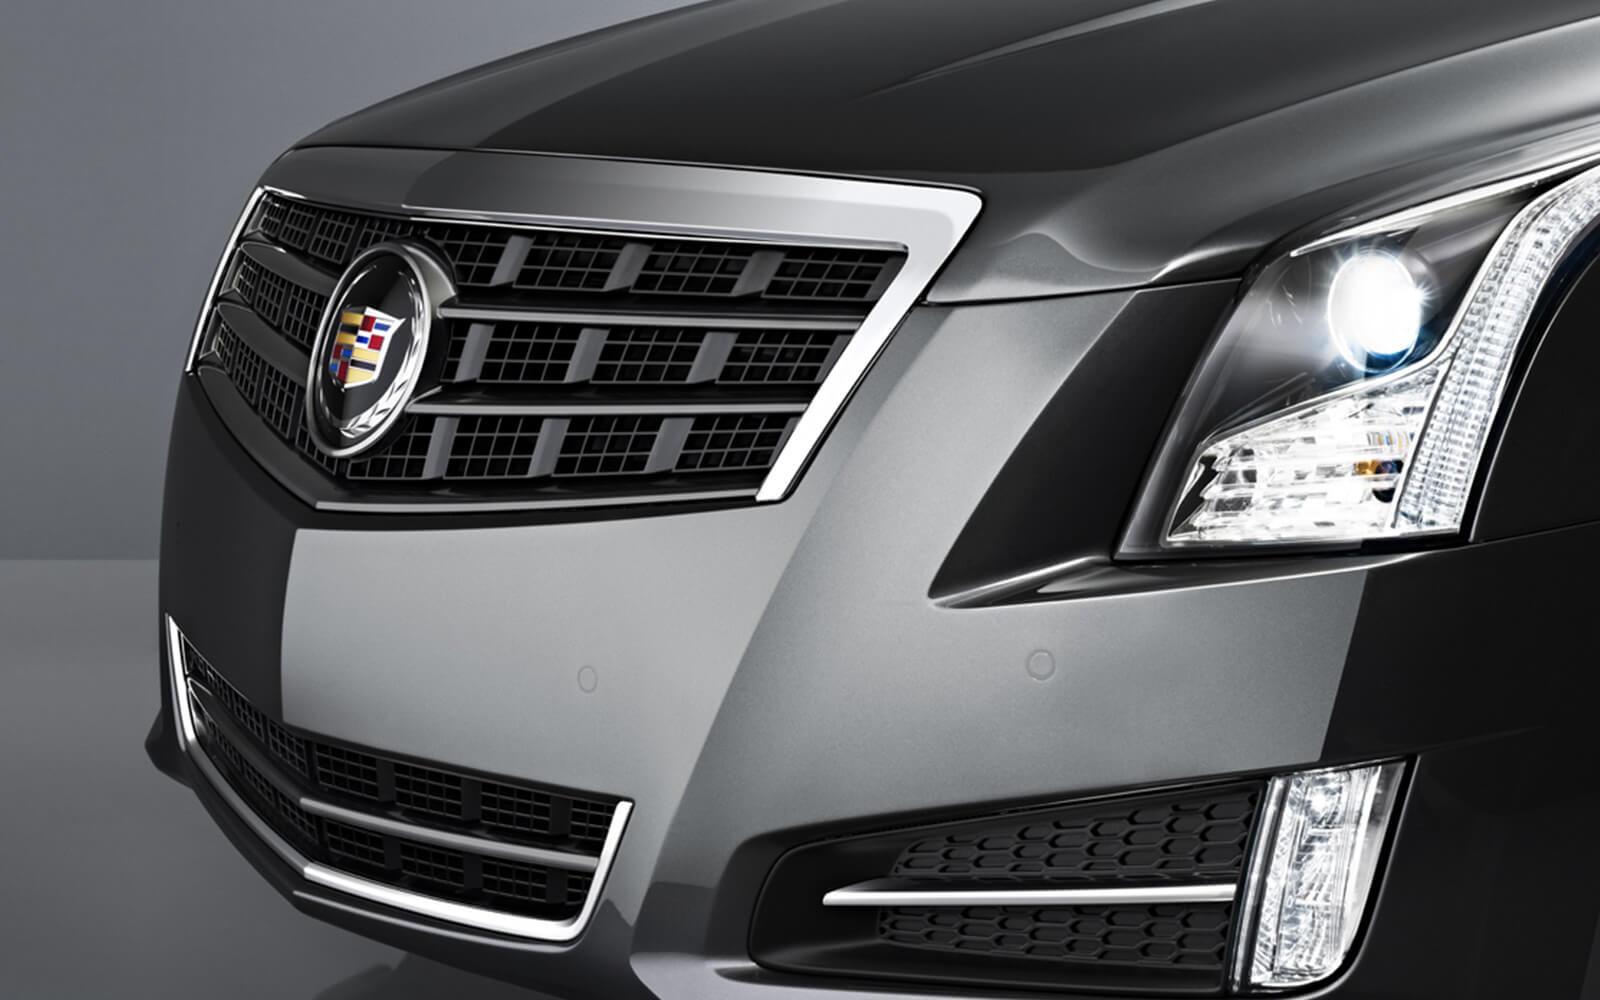 Cadillac #crossinghoricons